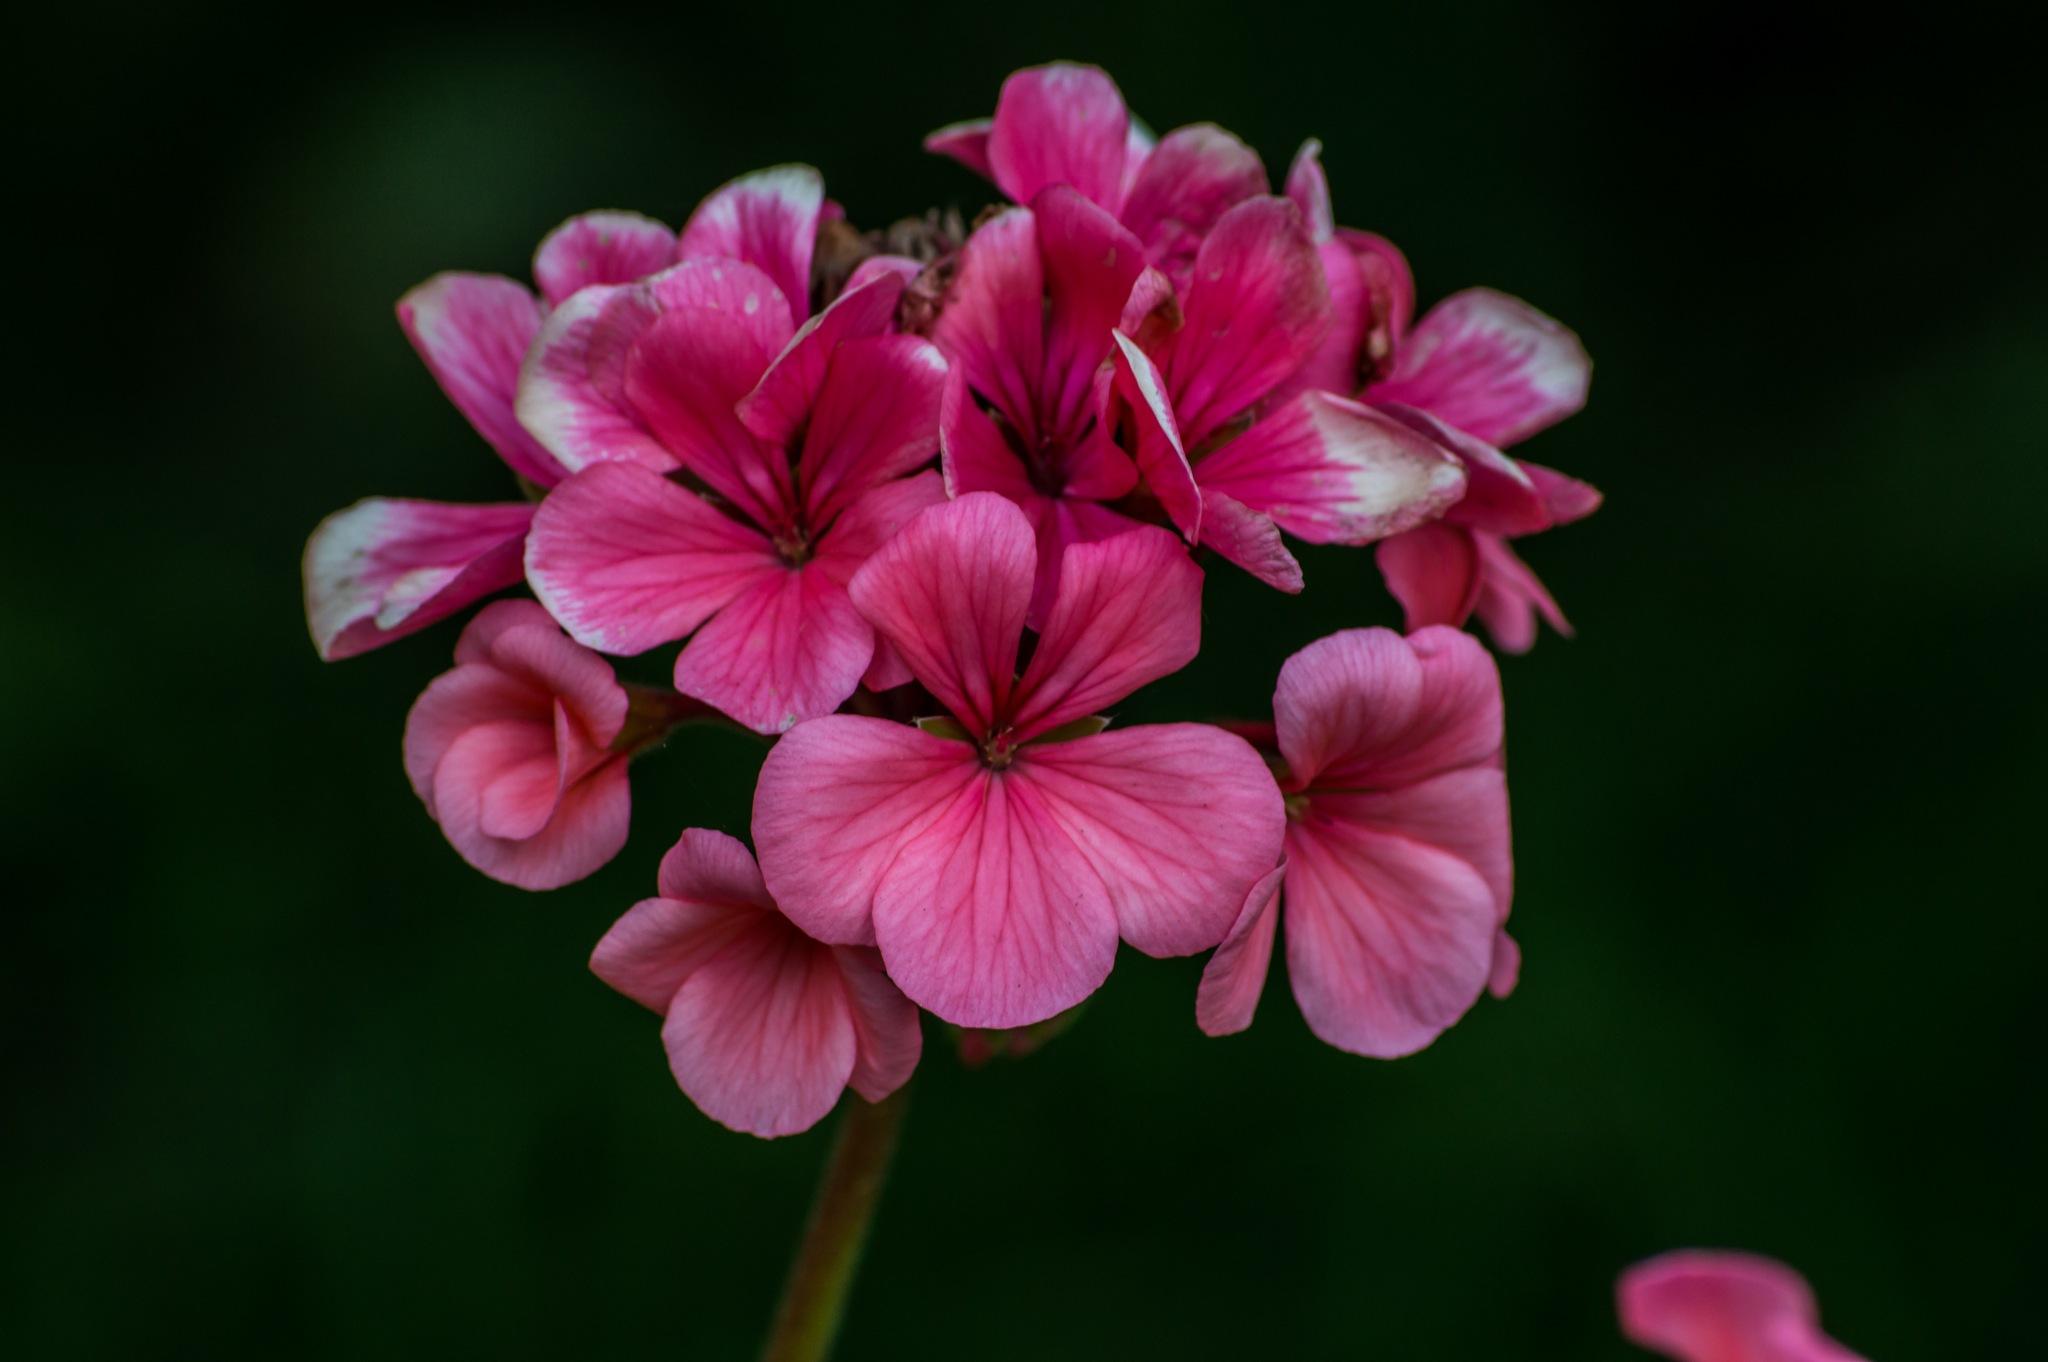 Pink flower by Iulian Bud